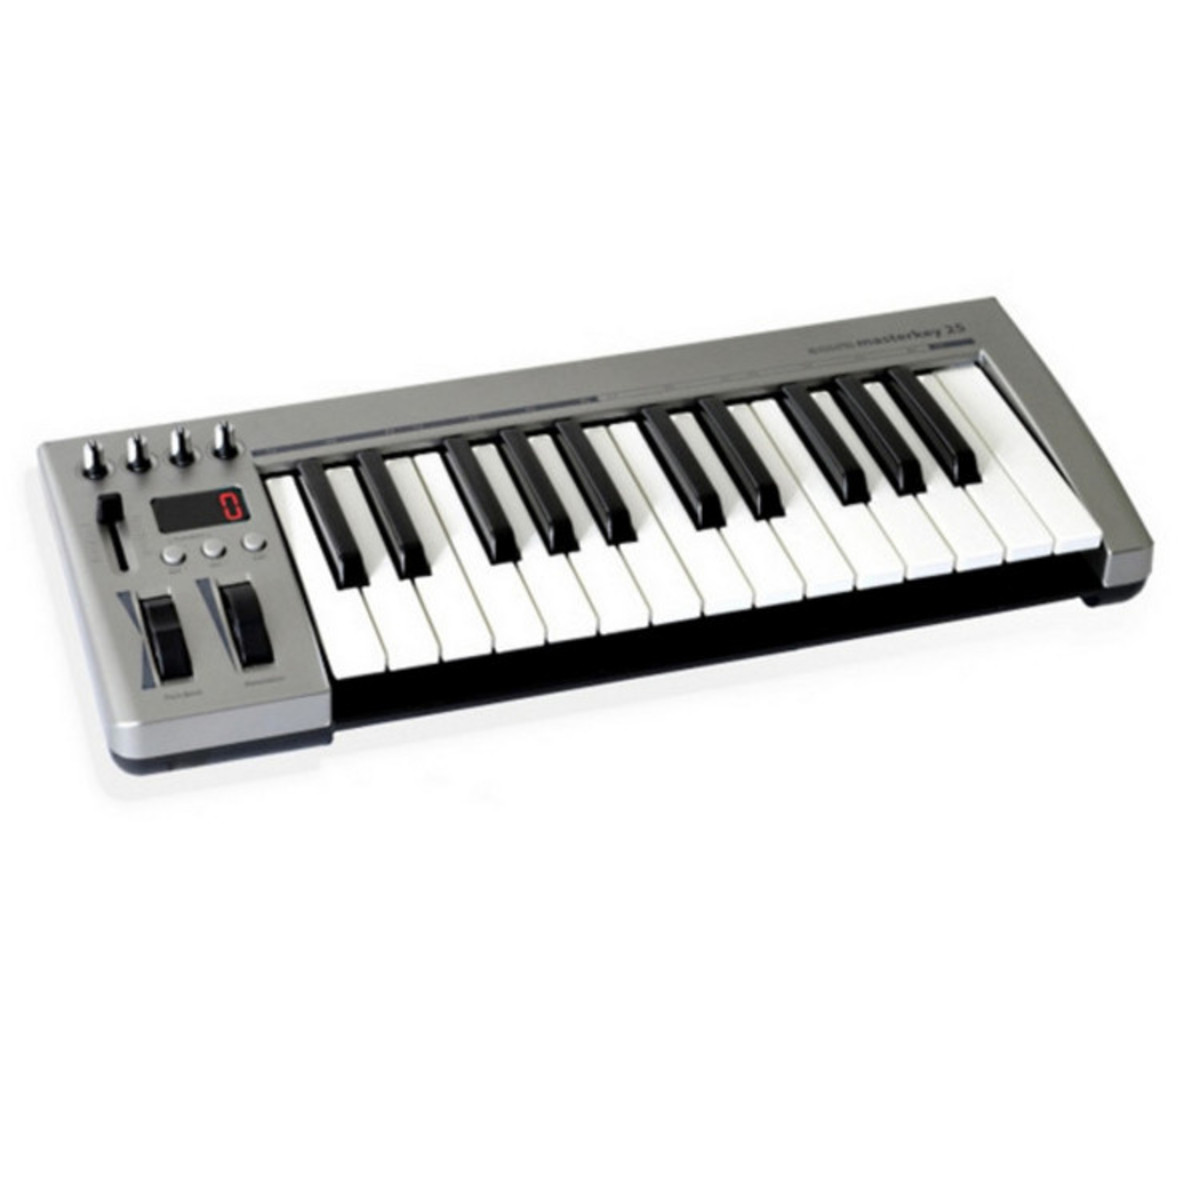 steinberg cubase elements 7 acorn masterkey 25 usb midi keyboard at gear4music. Black Bedroom Furniture Sets. Home Design Ideas